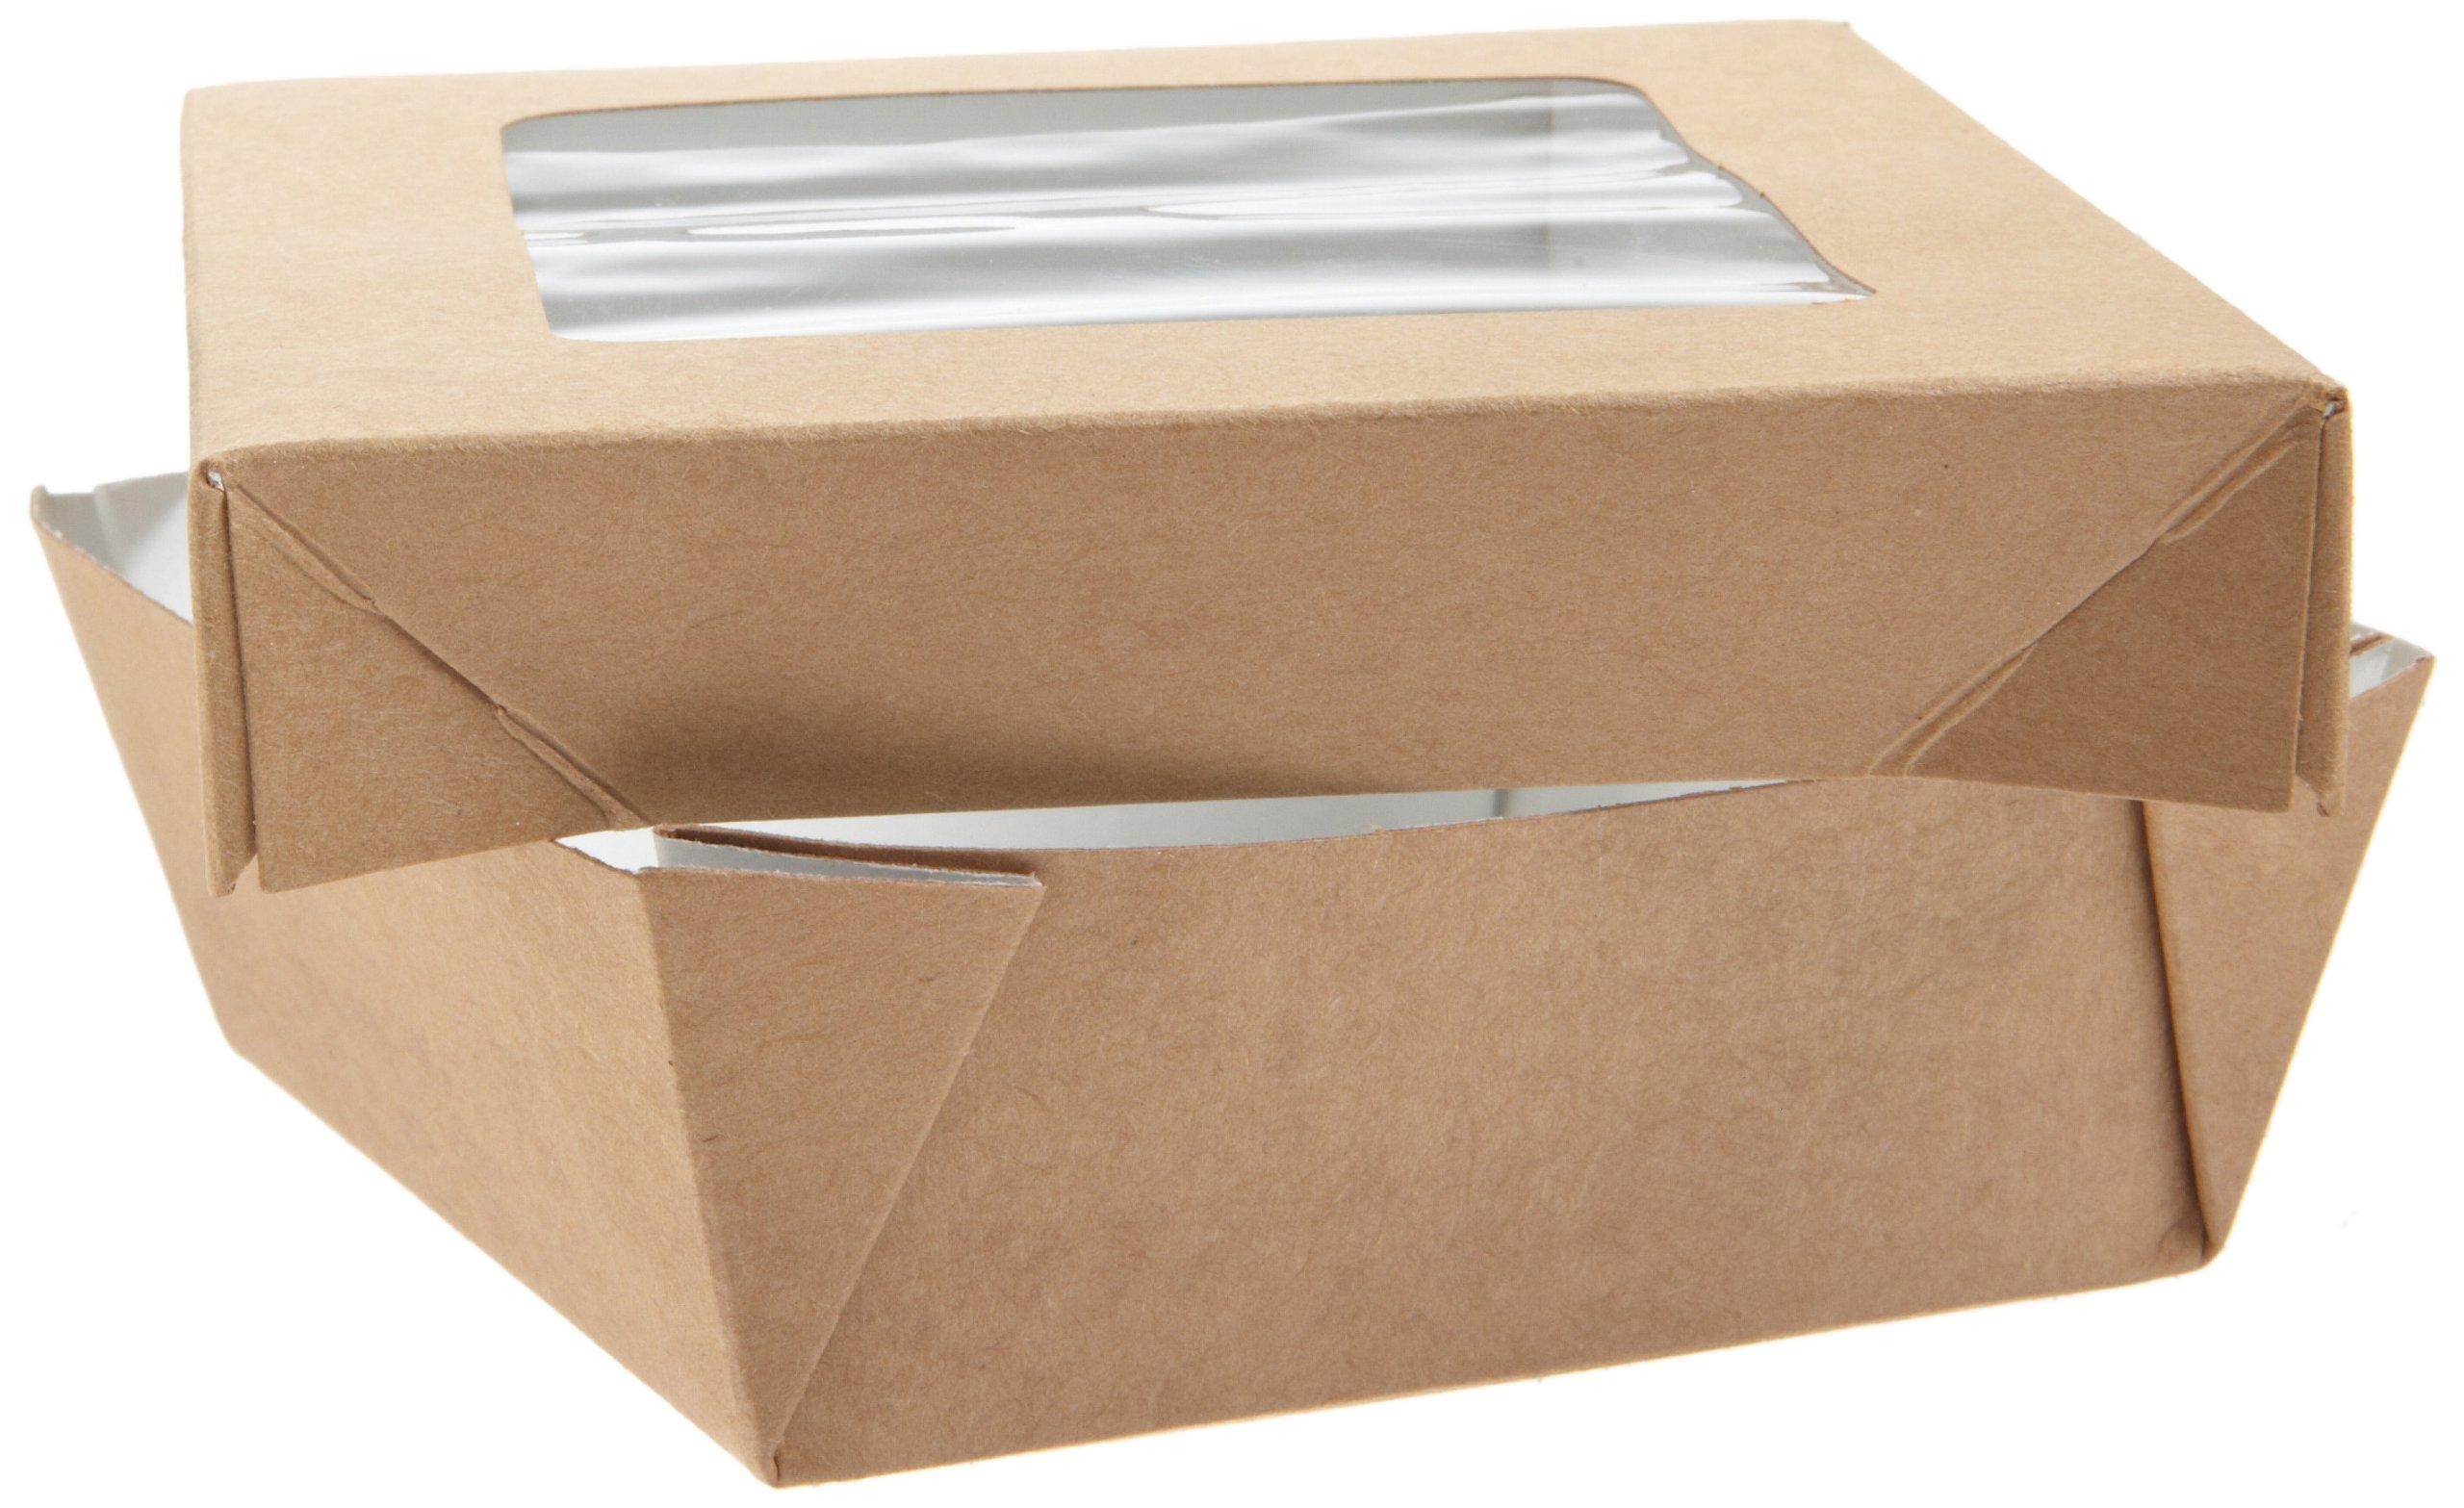 PackNWood 210KRAYB115 Small Kray Box with Window Lid - 12 oz - 3.9 x 3.9 x 1.6'' - 250 per case